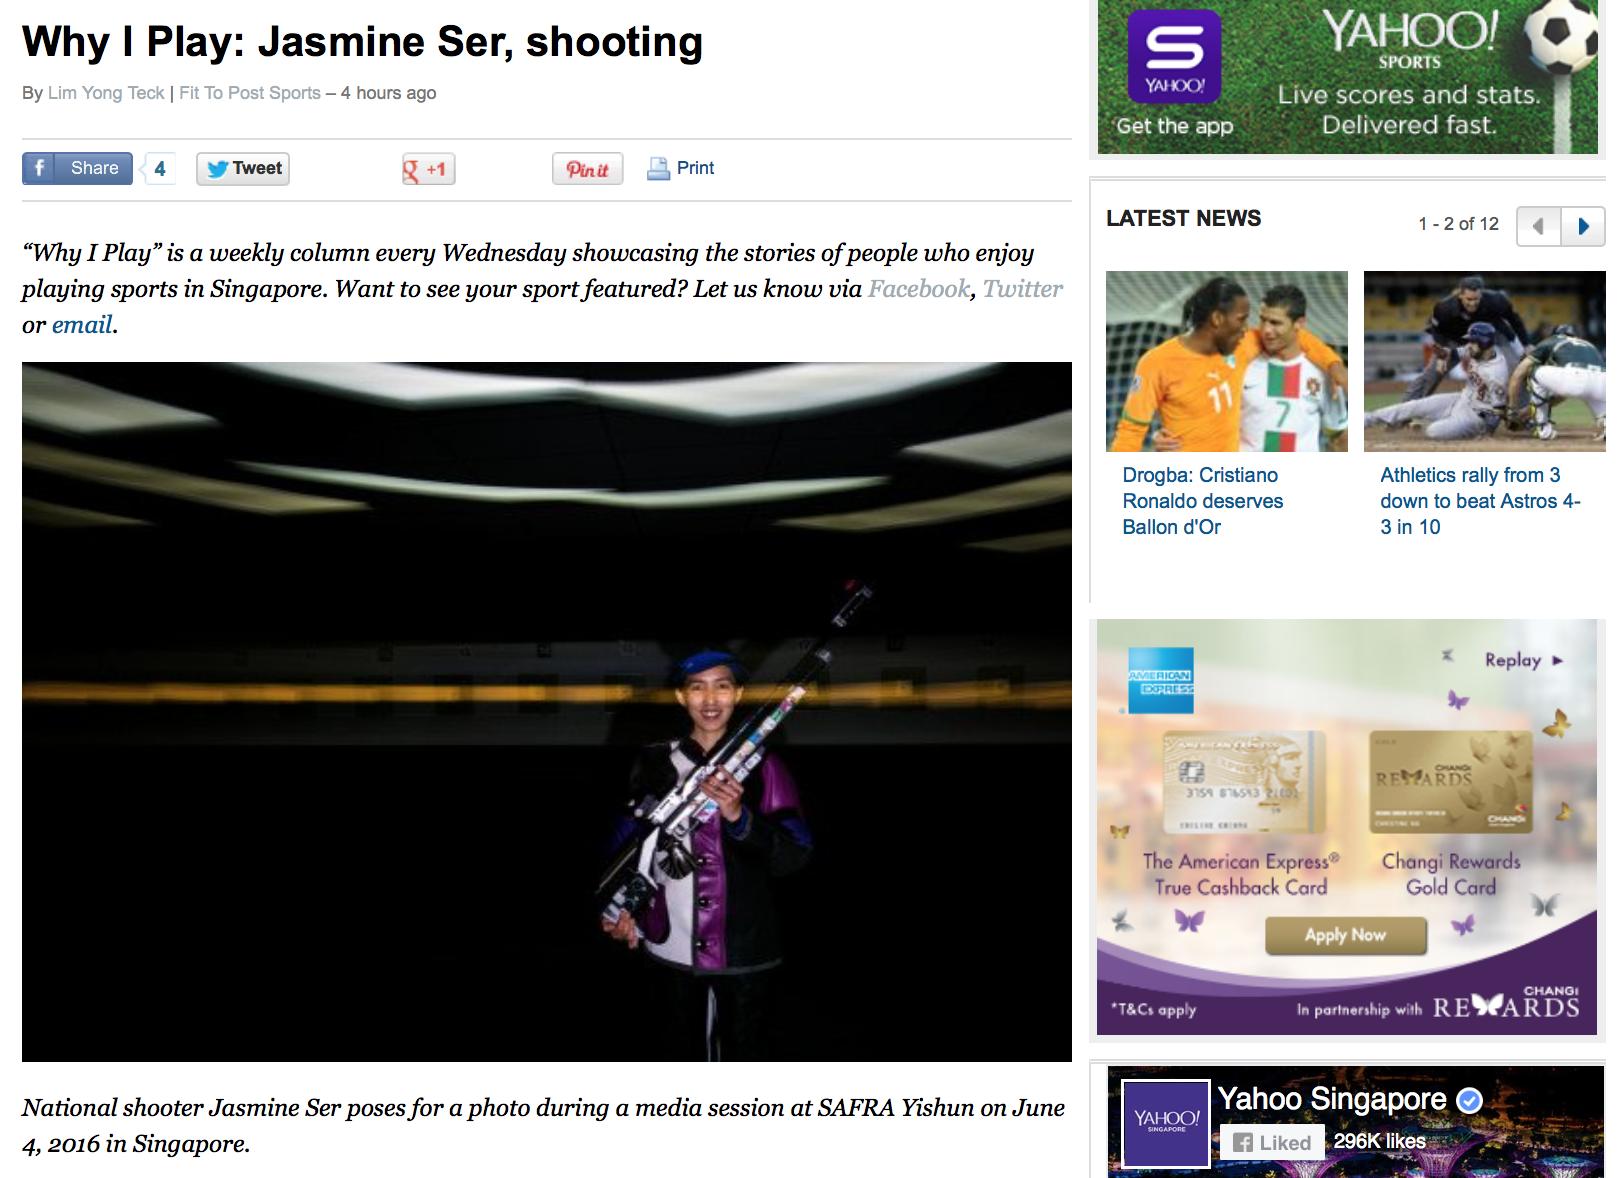 Jasmine Ser feature for Yahoo! (www.yahoo.com)